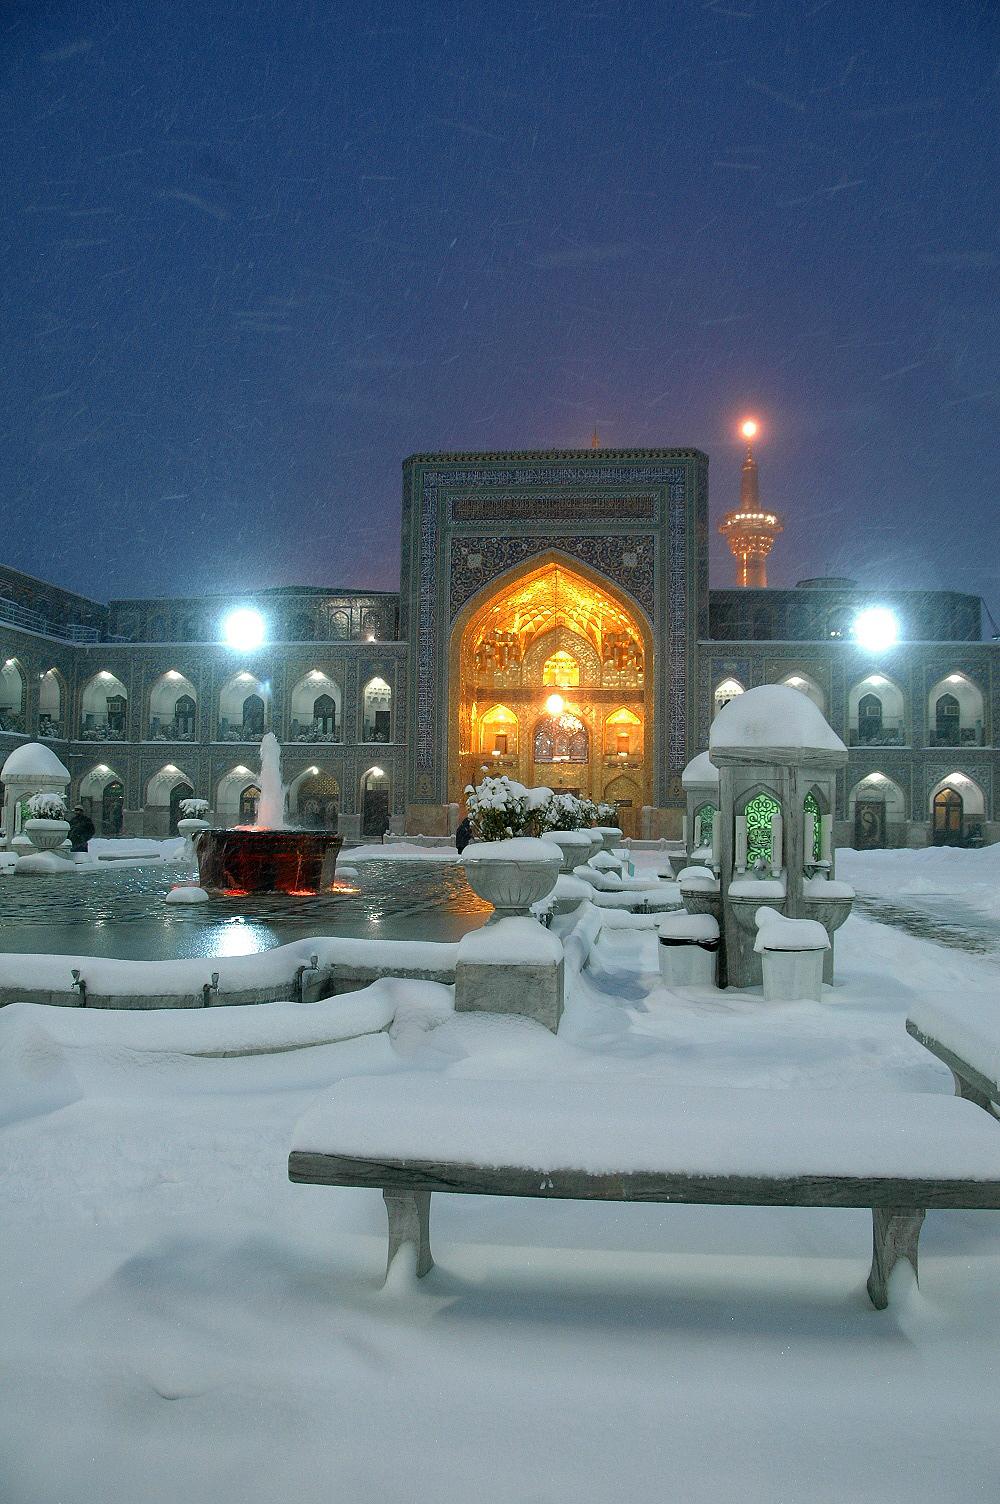 http://www.sibtayn.com/swf/gallery/images/shahrha/mashhad/reza/sahan_reza/pic3/pic15.jpg